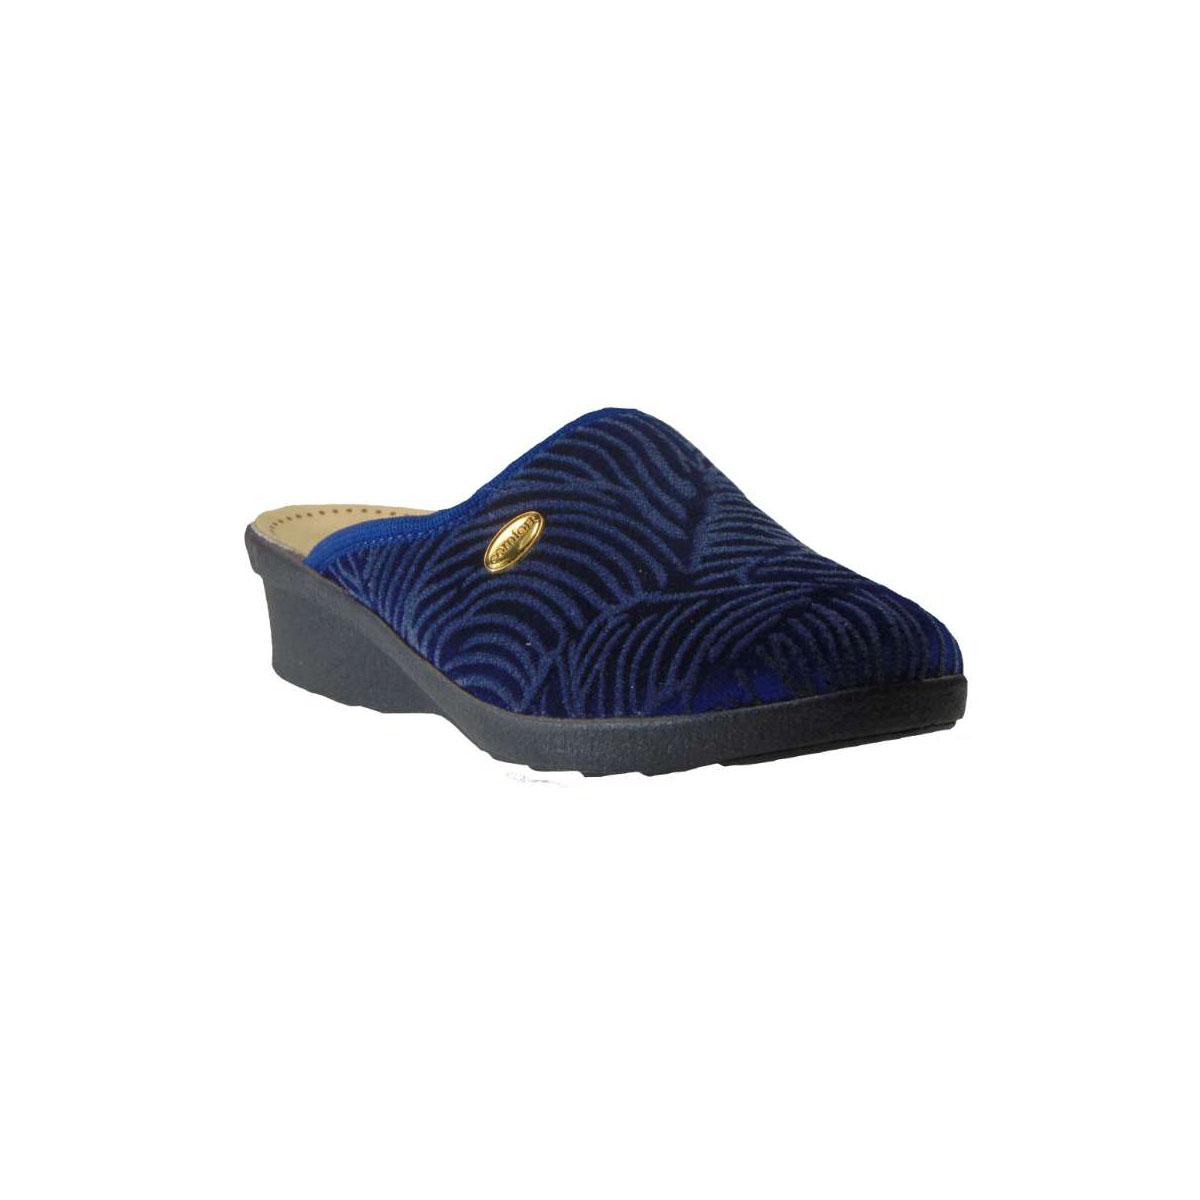 Le Soft 30013 Γυναικεία Ανατομική Παντόφλα Μπλε